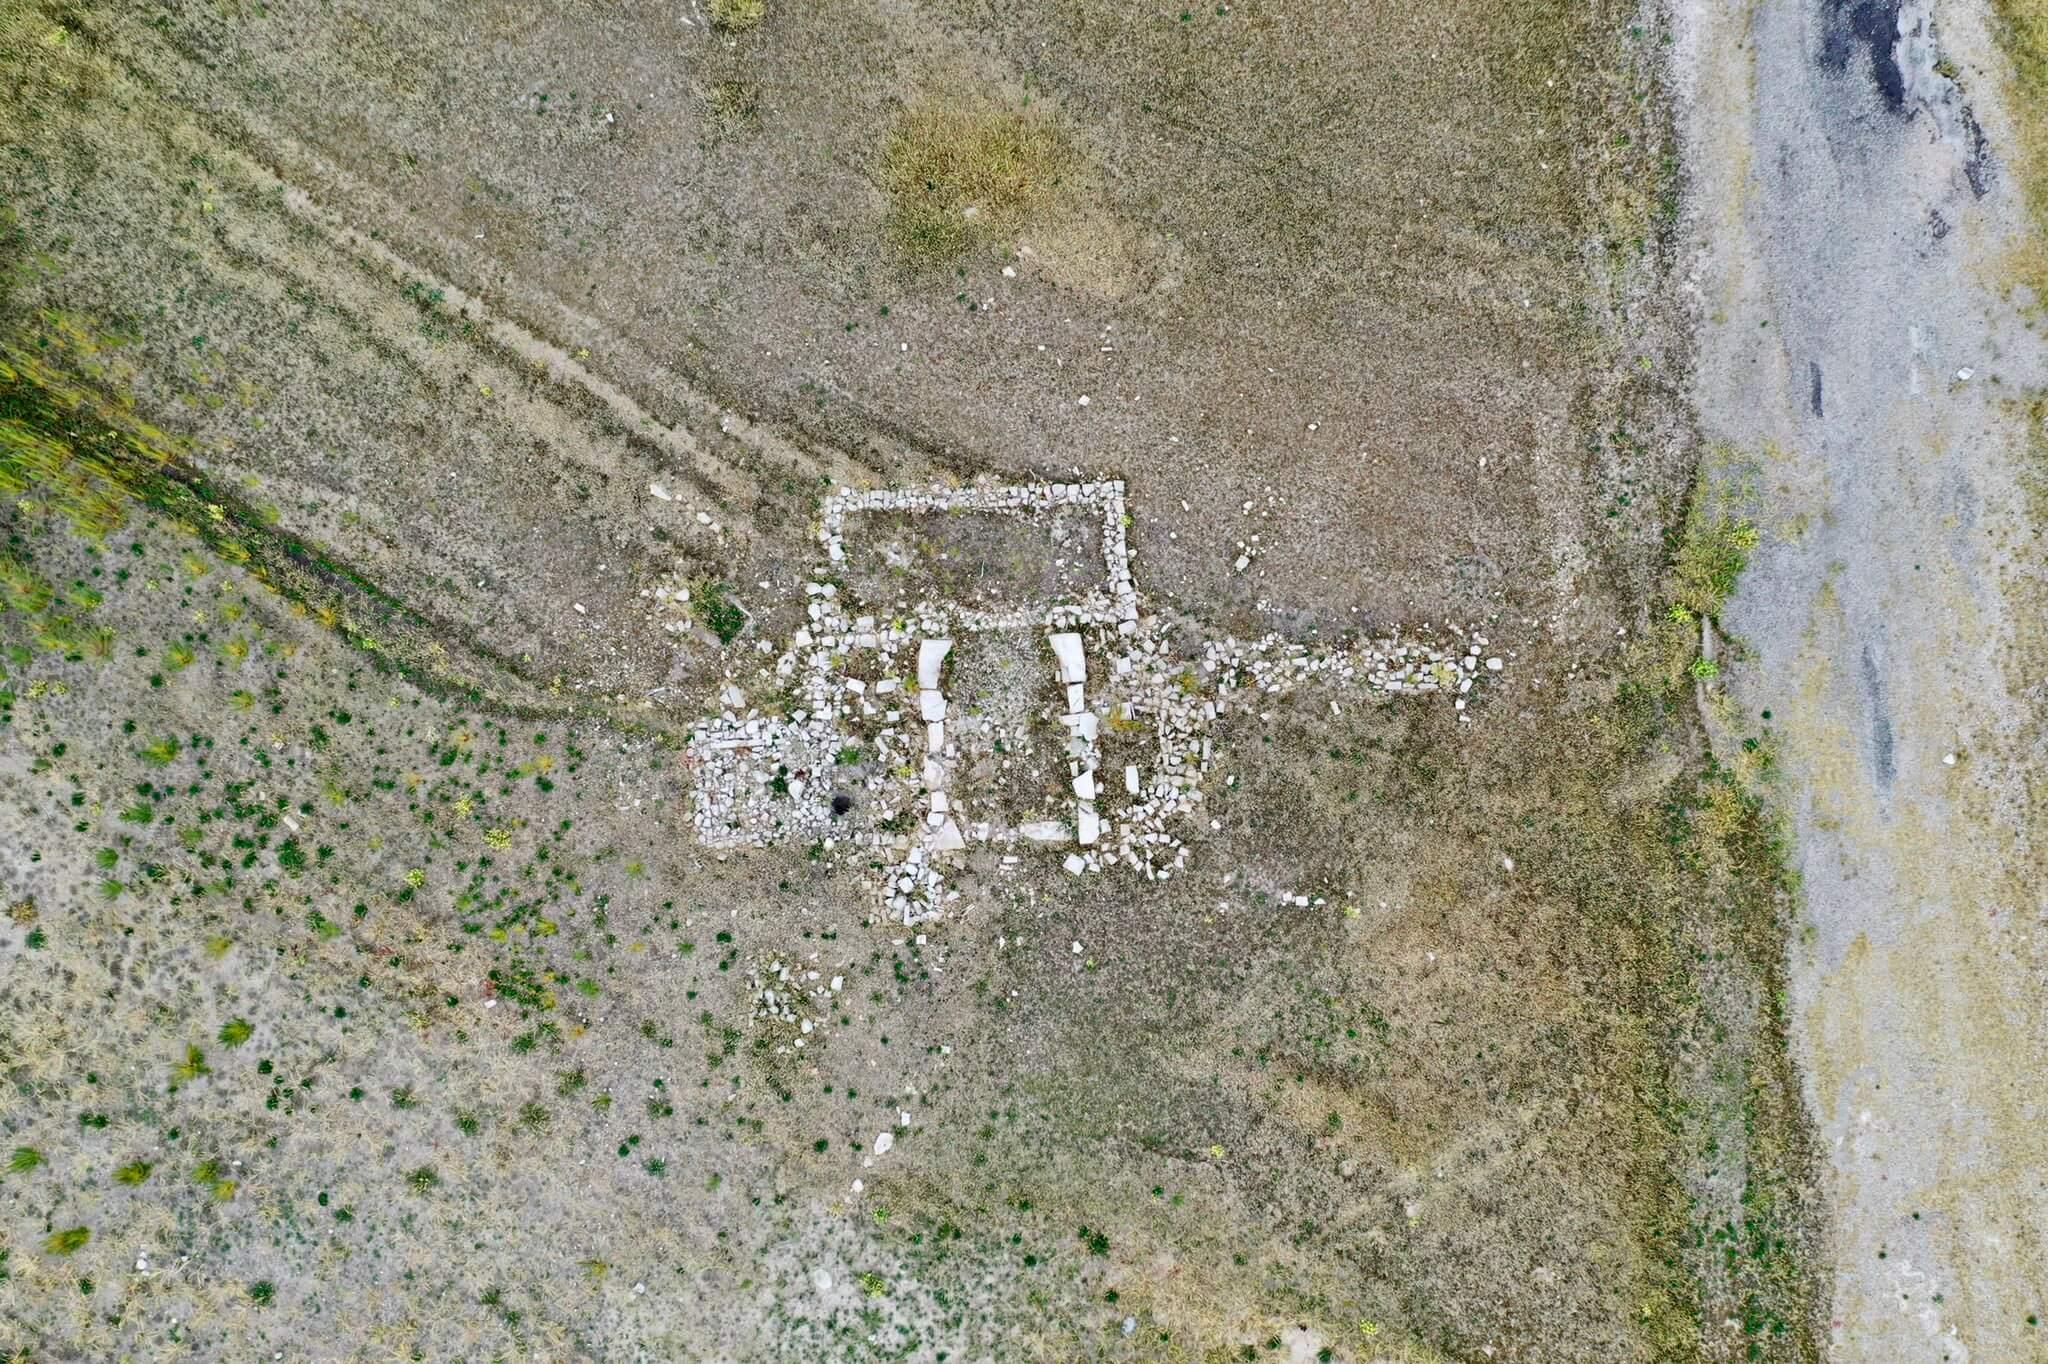 drone shot of Rockport Reservoir ghost town by Devon Dewey